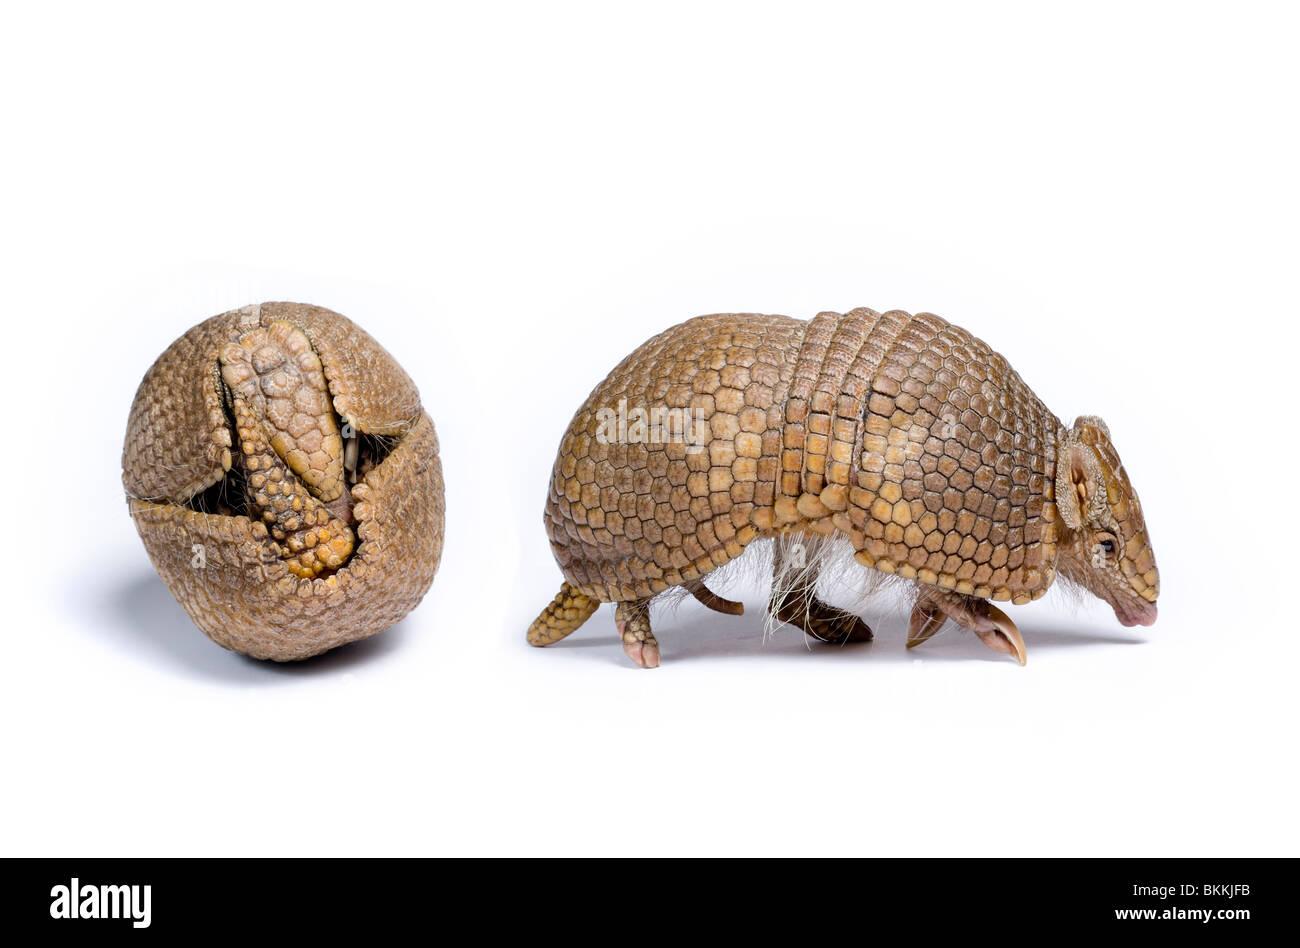 Armadillo de tres bandas (Tolypeutes tricinctus cautivo) Imagen De Stock